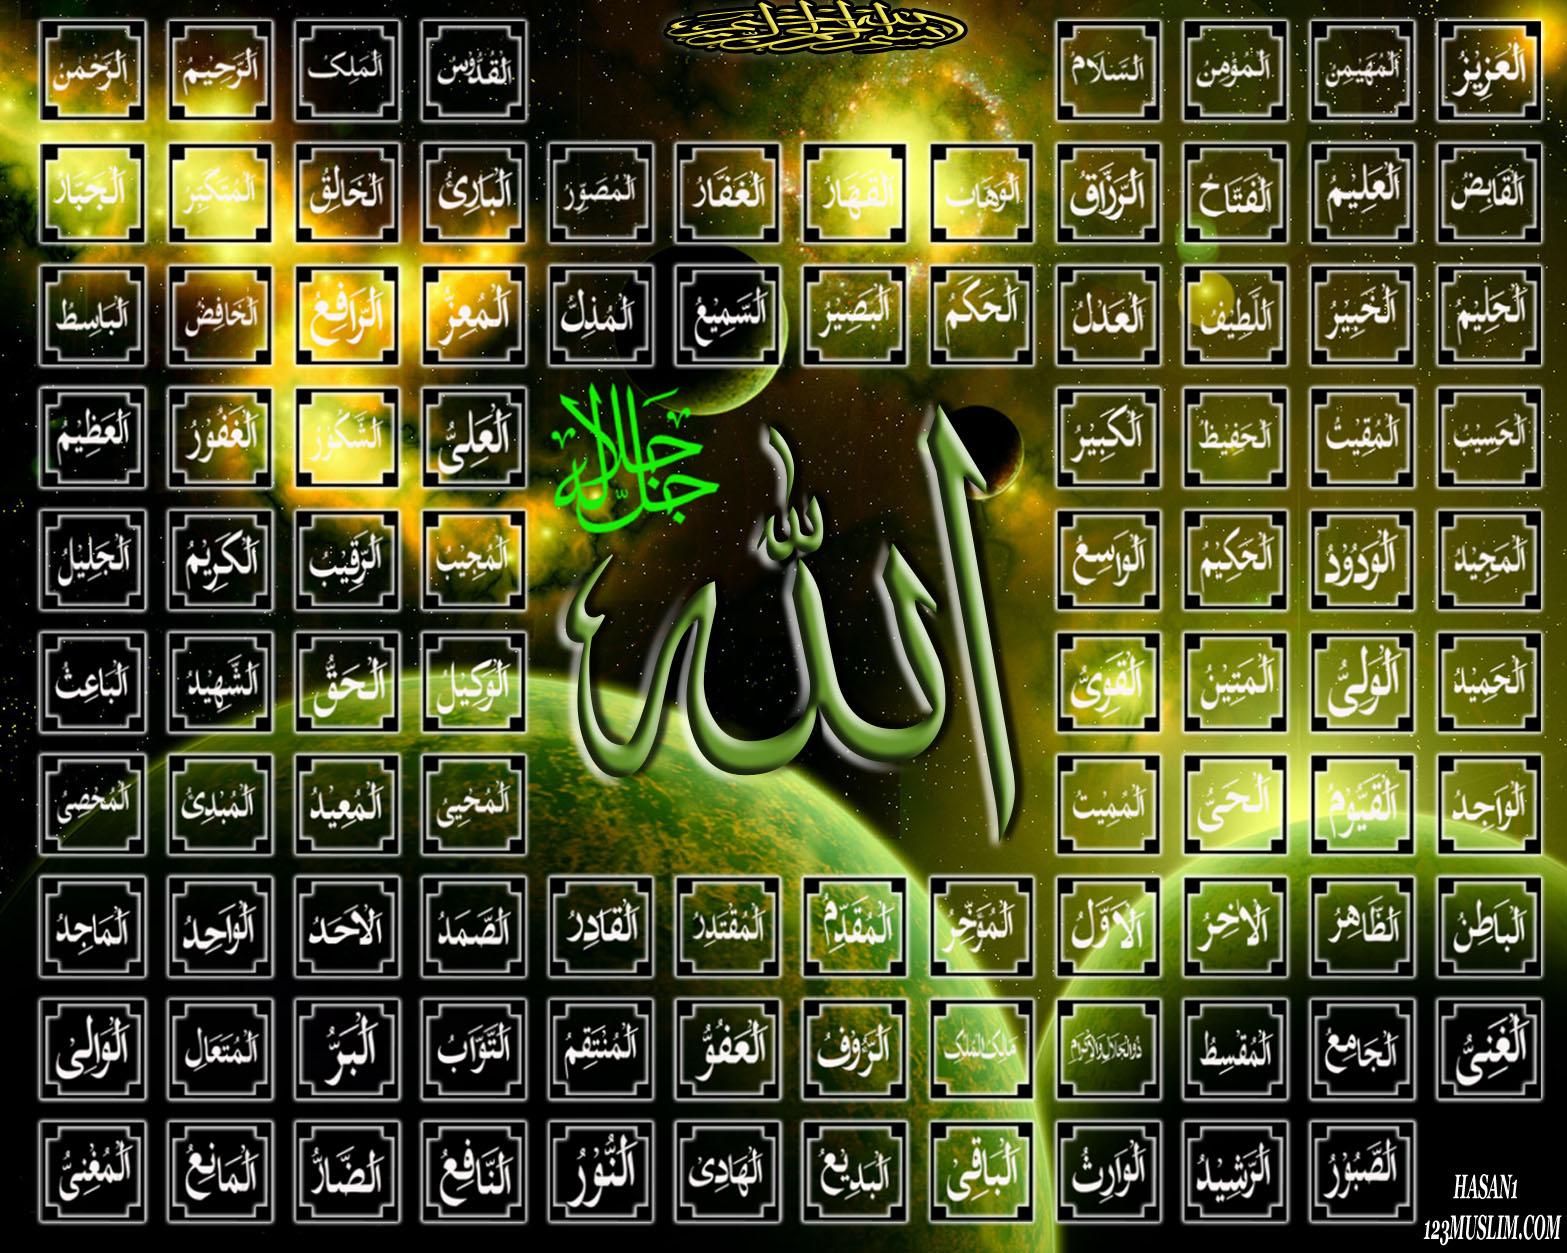 http://1.bp.blogspot.com/-pBe_U2Qe8u4/UB7I2vZcweI/AAAAAAAAAEo/3B20j0931sc/s1600/Allah99Names.jpg